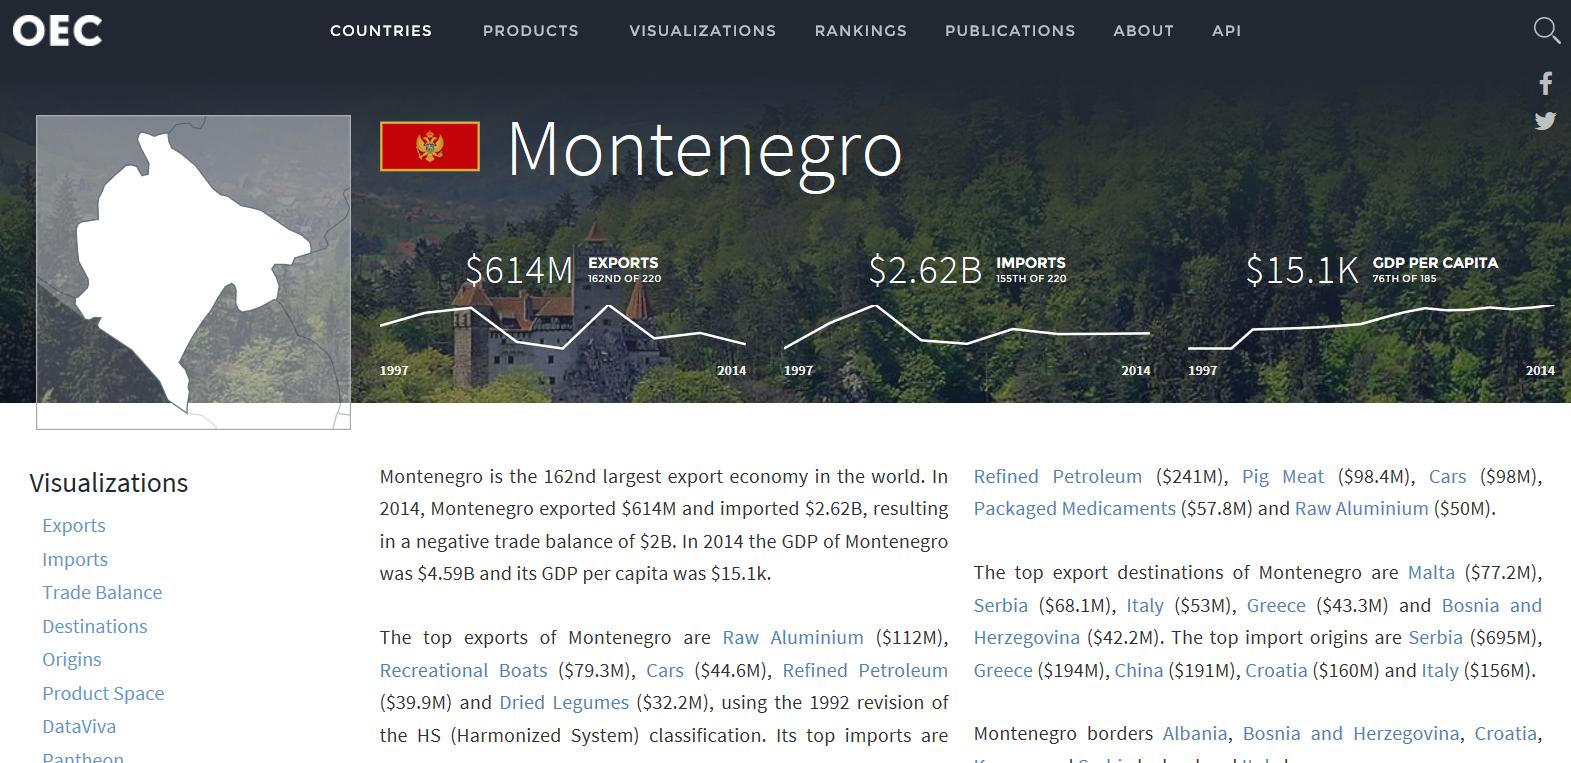 montenegro-exports-to-malta-1